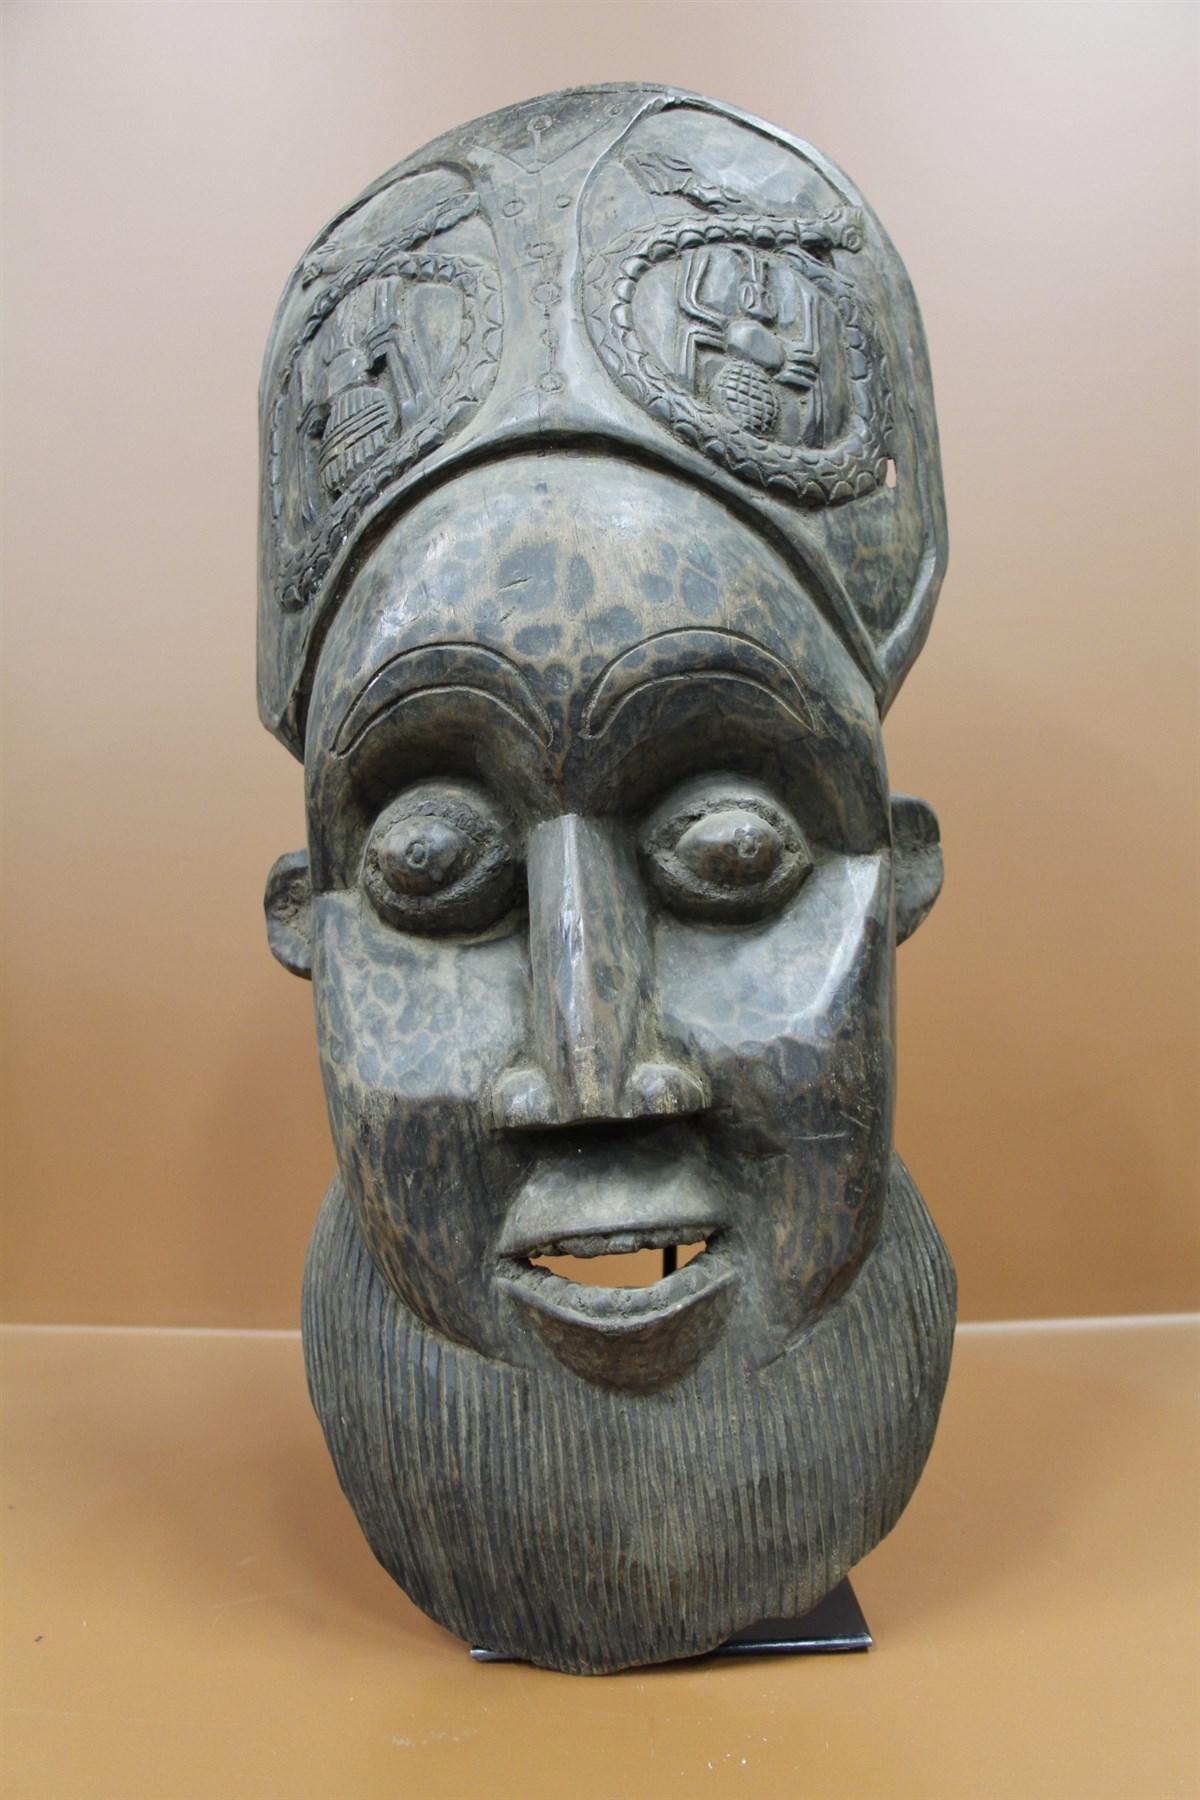 Masque Bamiléké - Déco africaine - Art africain traditionnel